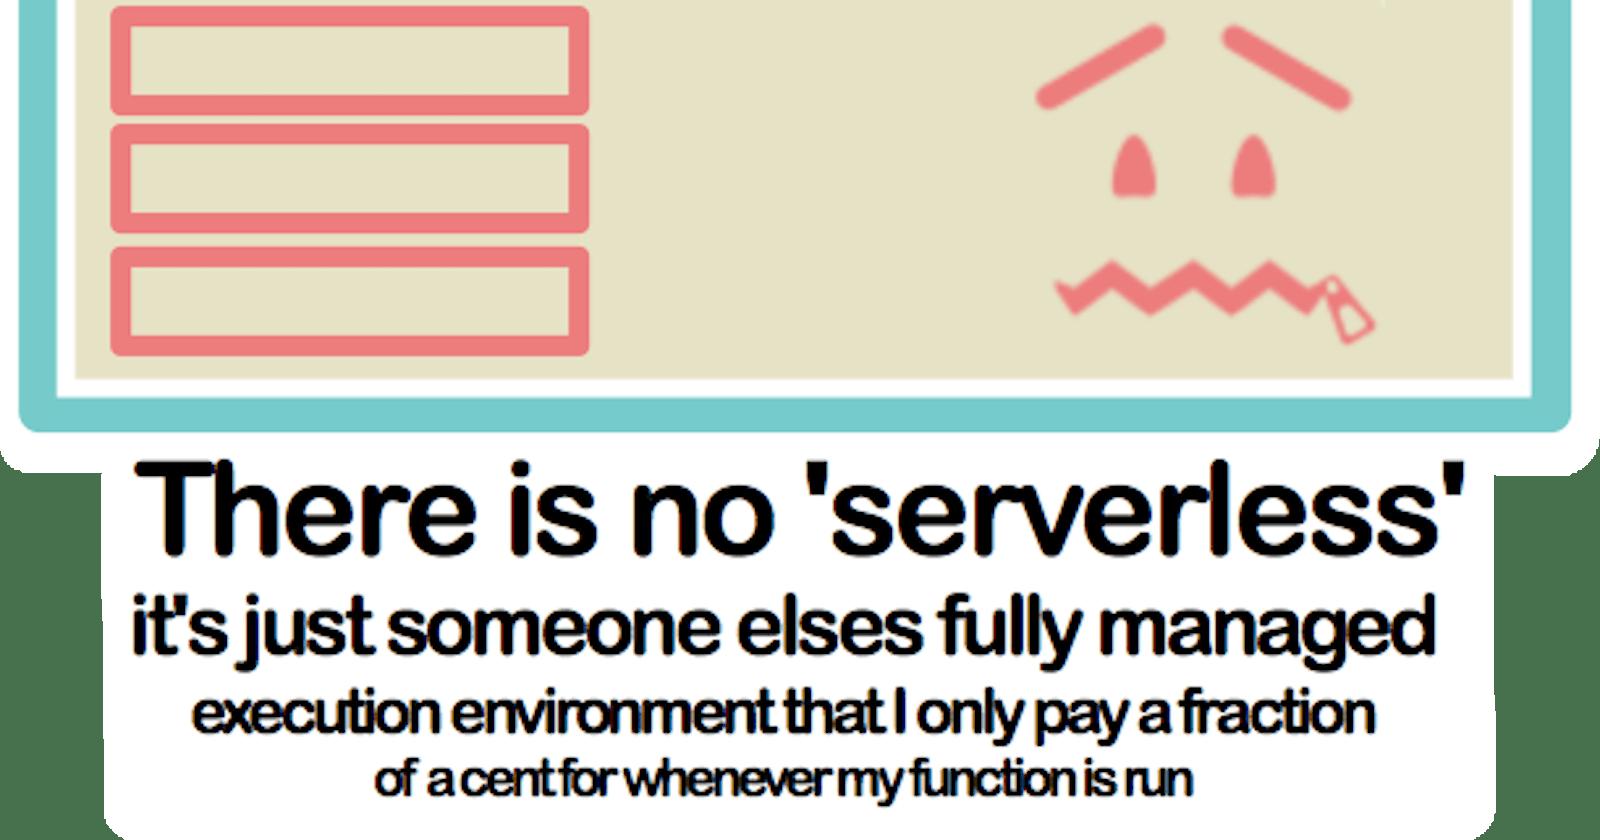 Understanding Serverless using Restaurant Server Analogy